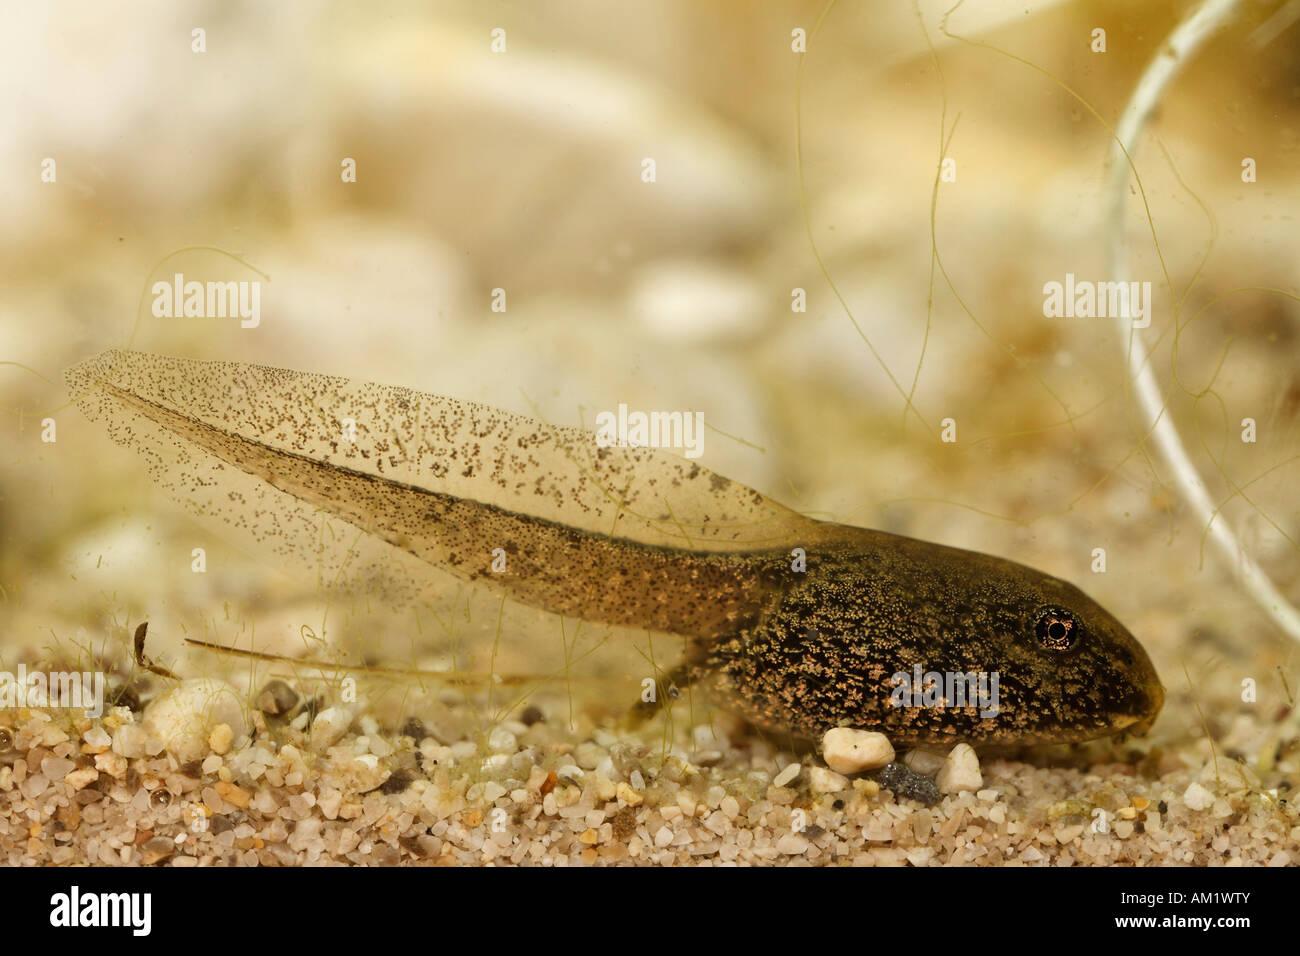 Tadpole of European Common Brown Frog, Rana temporaria - Stock Image